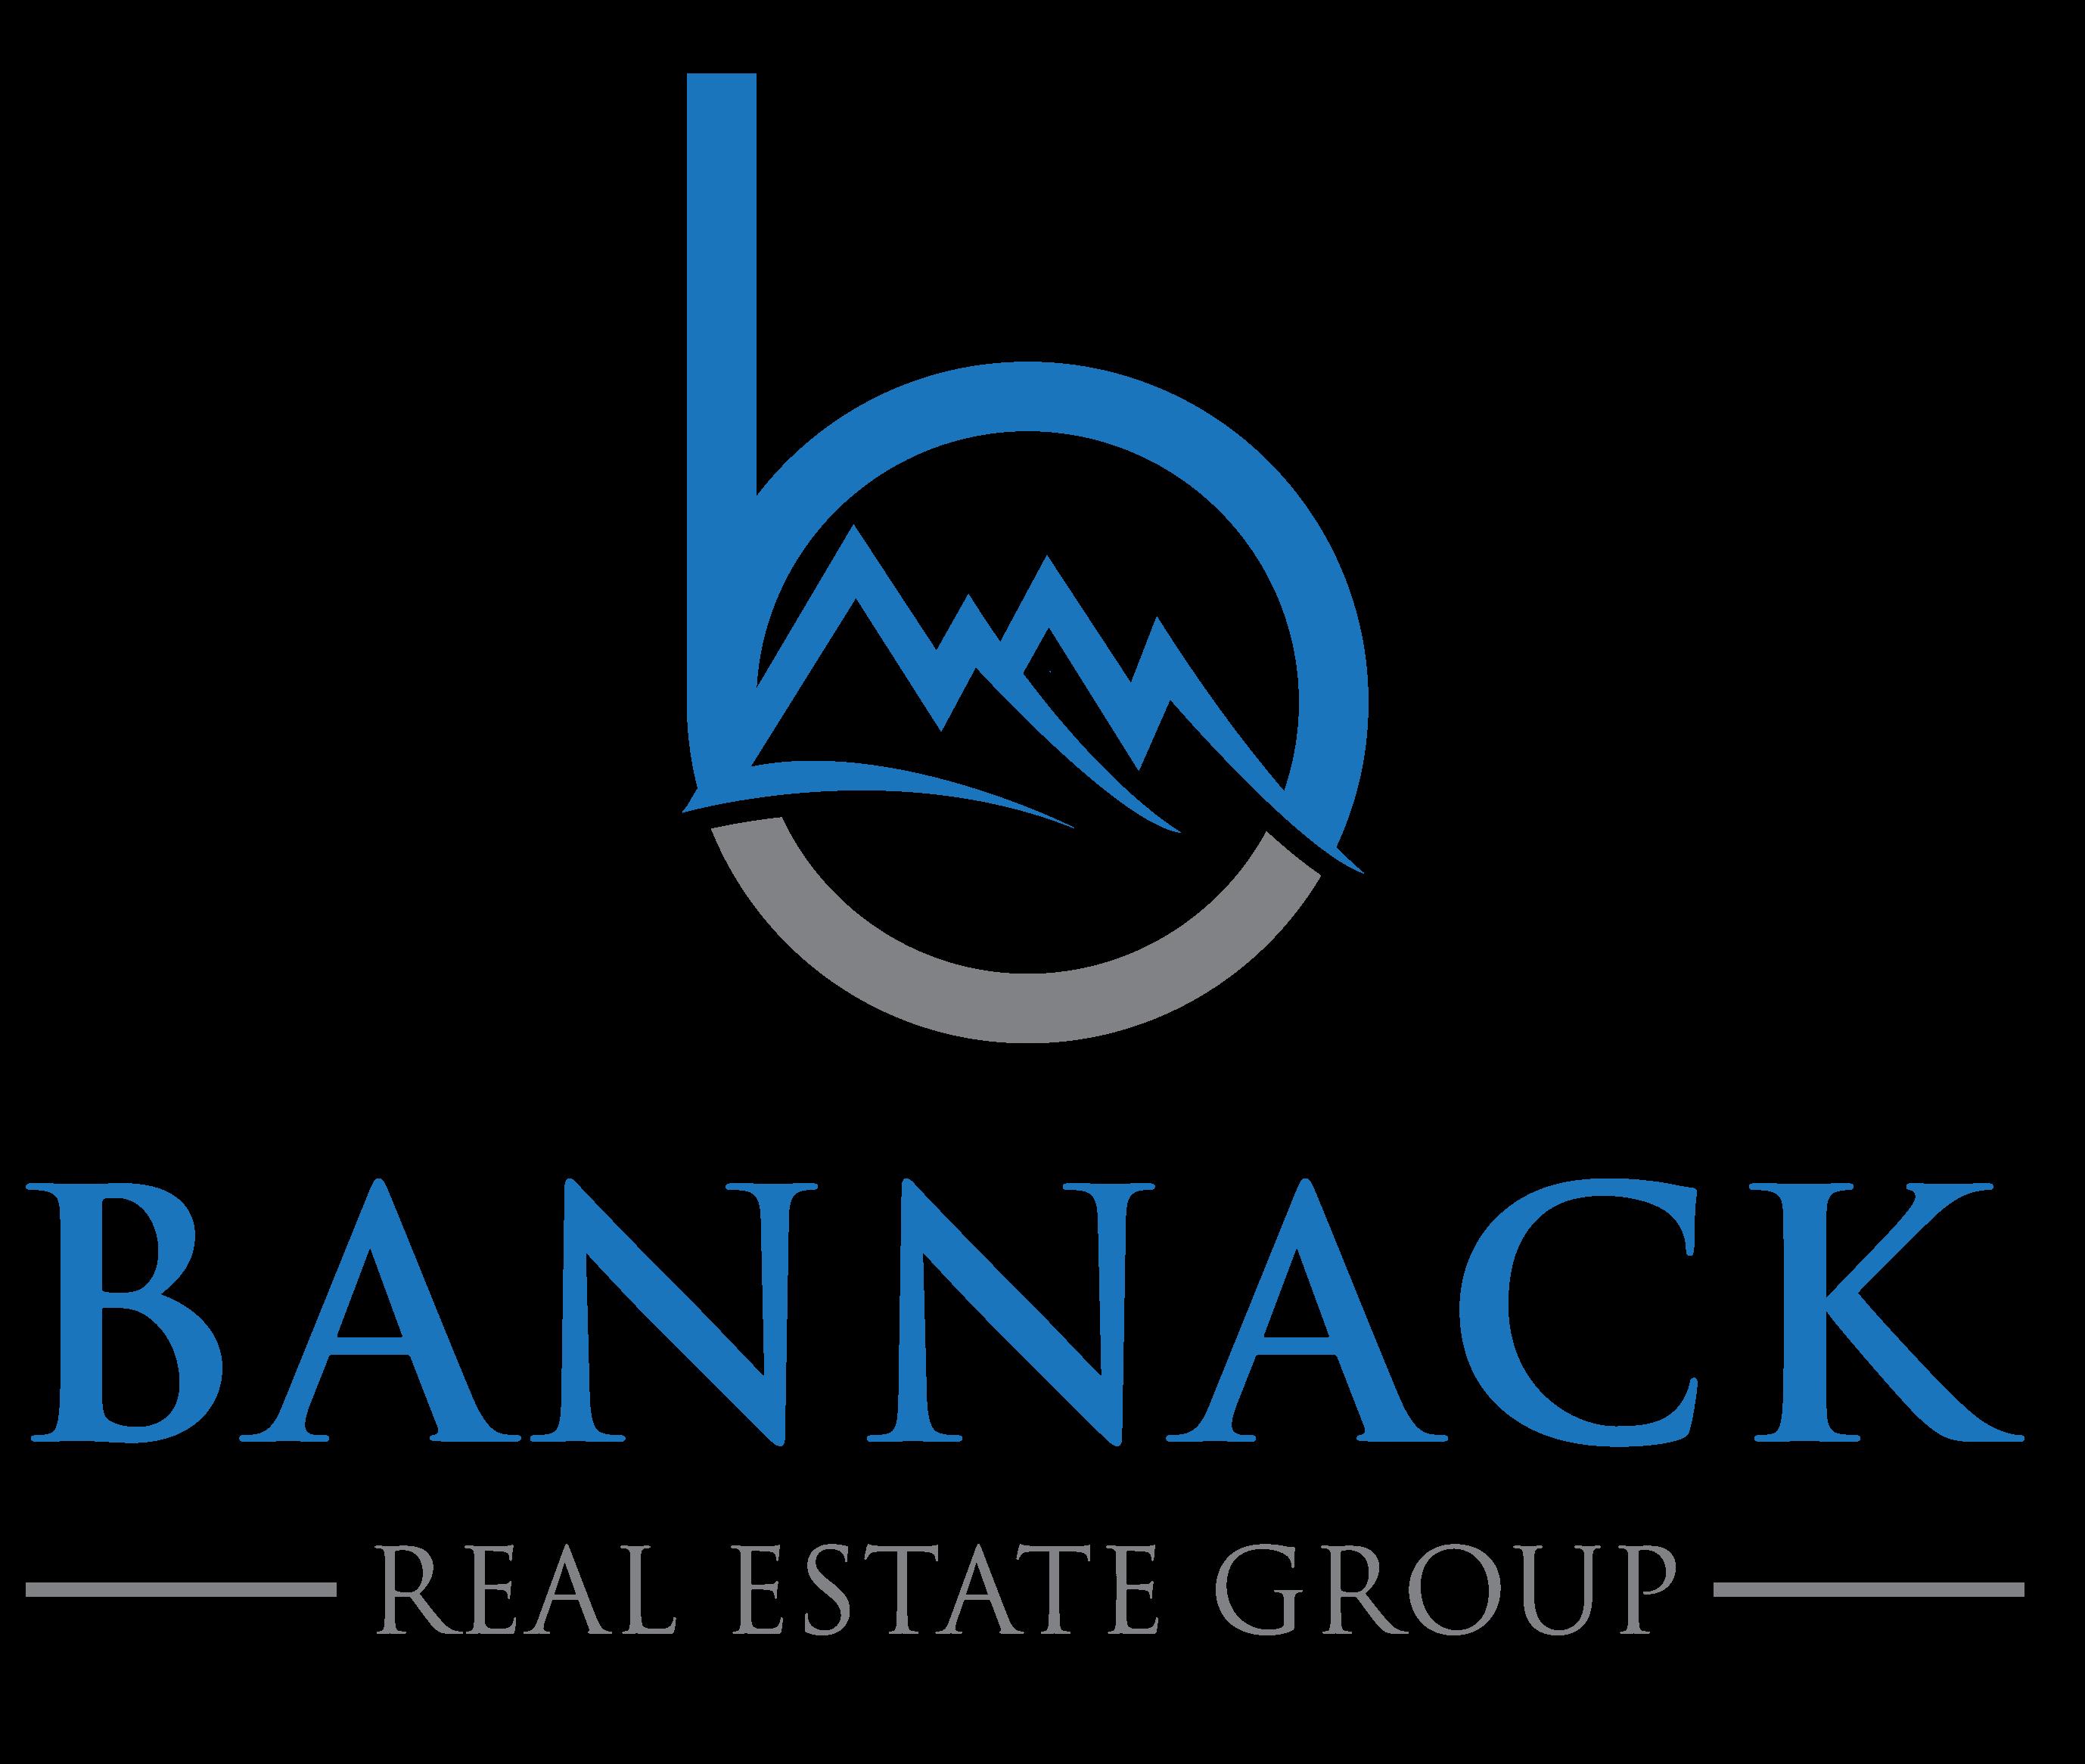 Bannack Real Estate Group logo